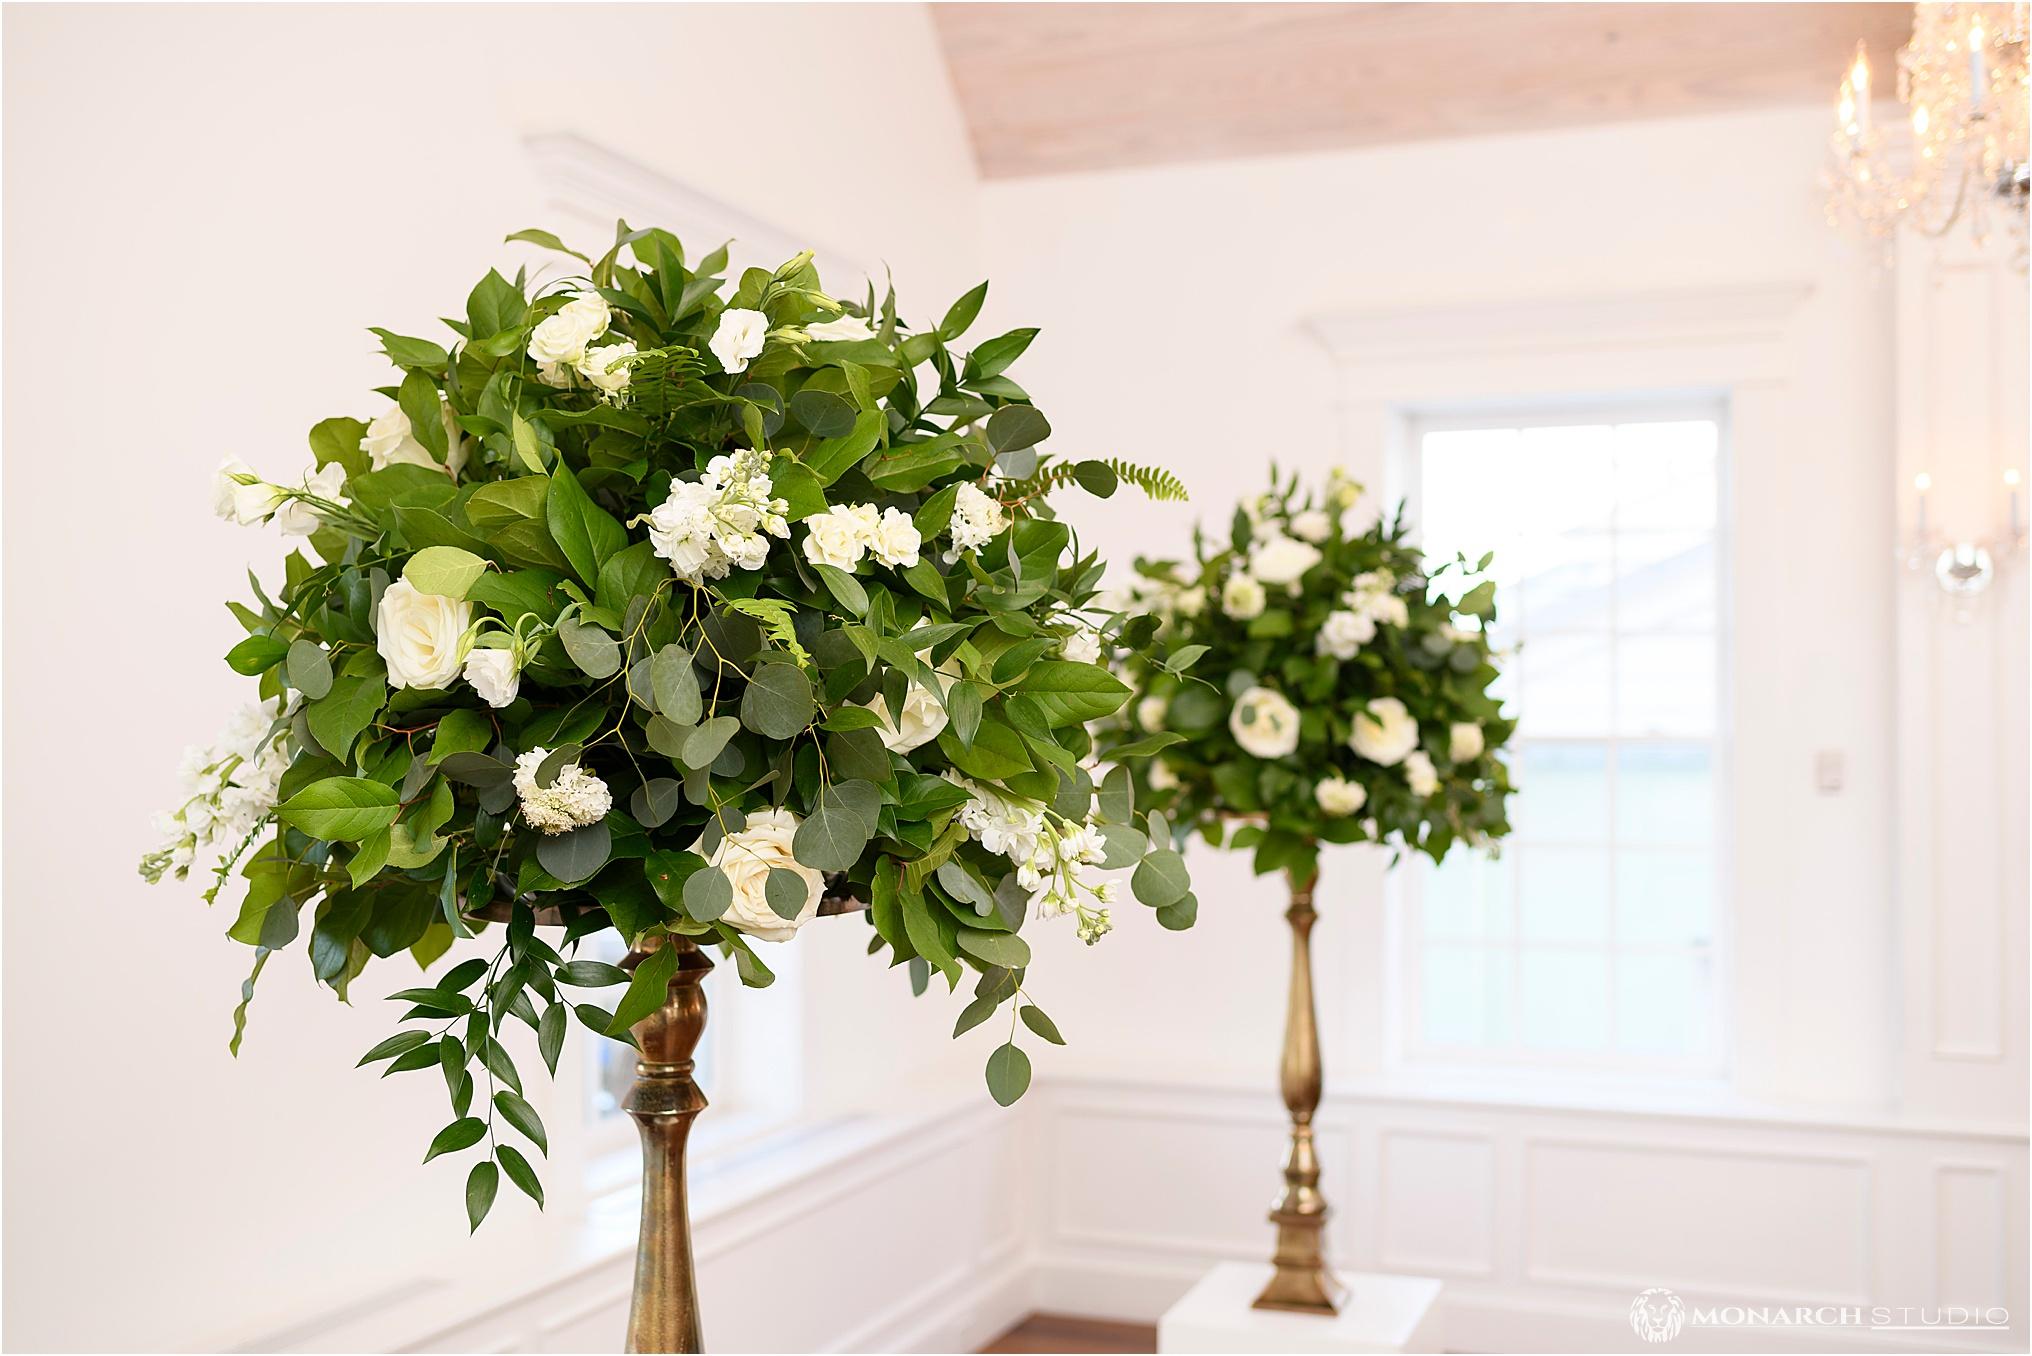 061-whiteroom-wedding-photographer-2019-05-22_0043.jpg